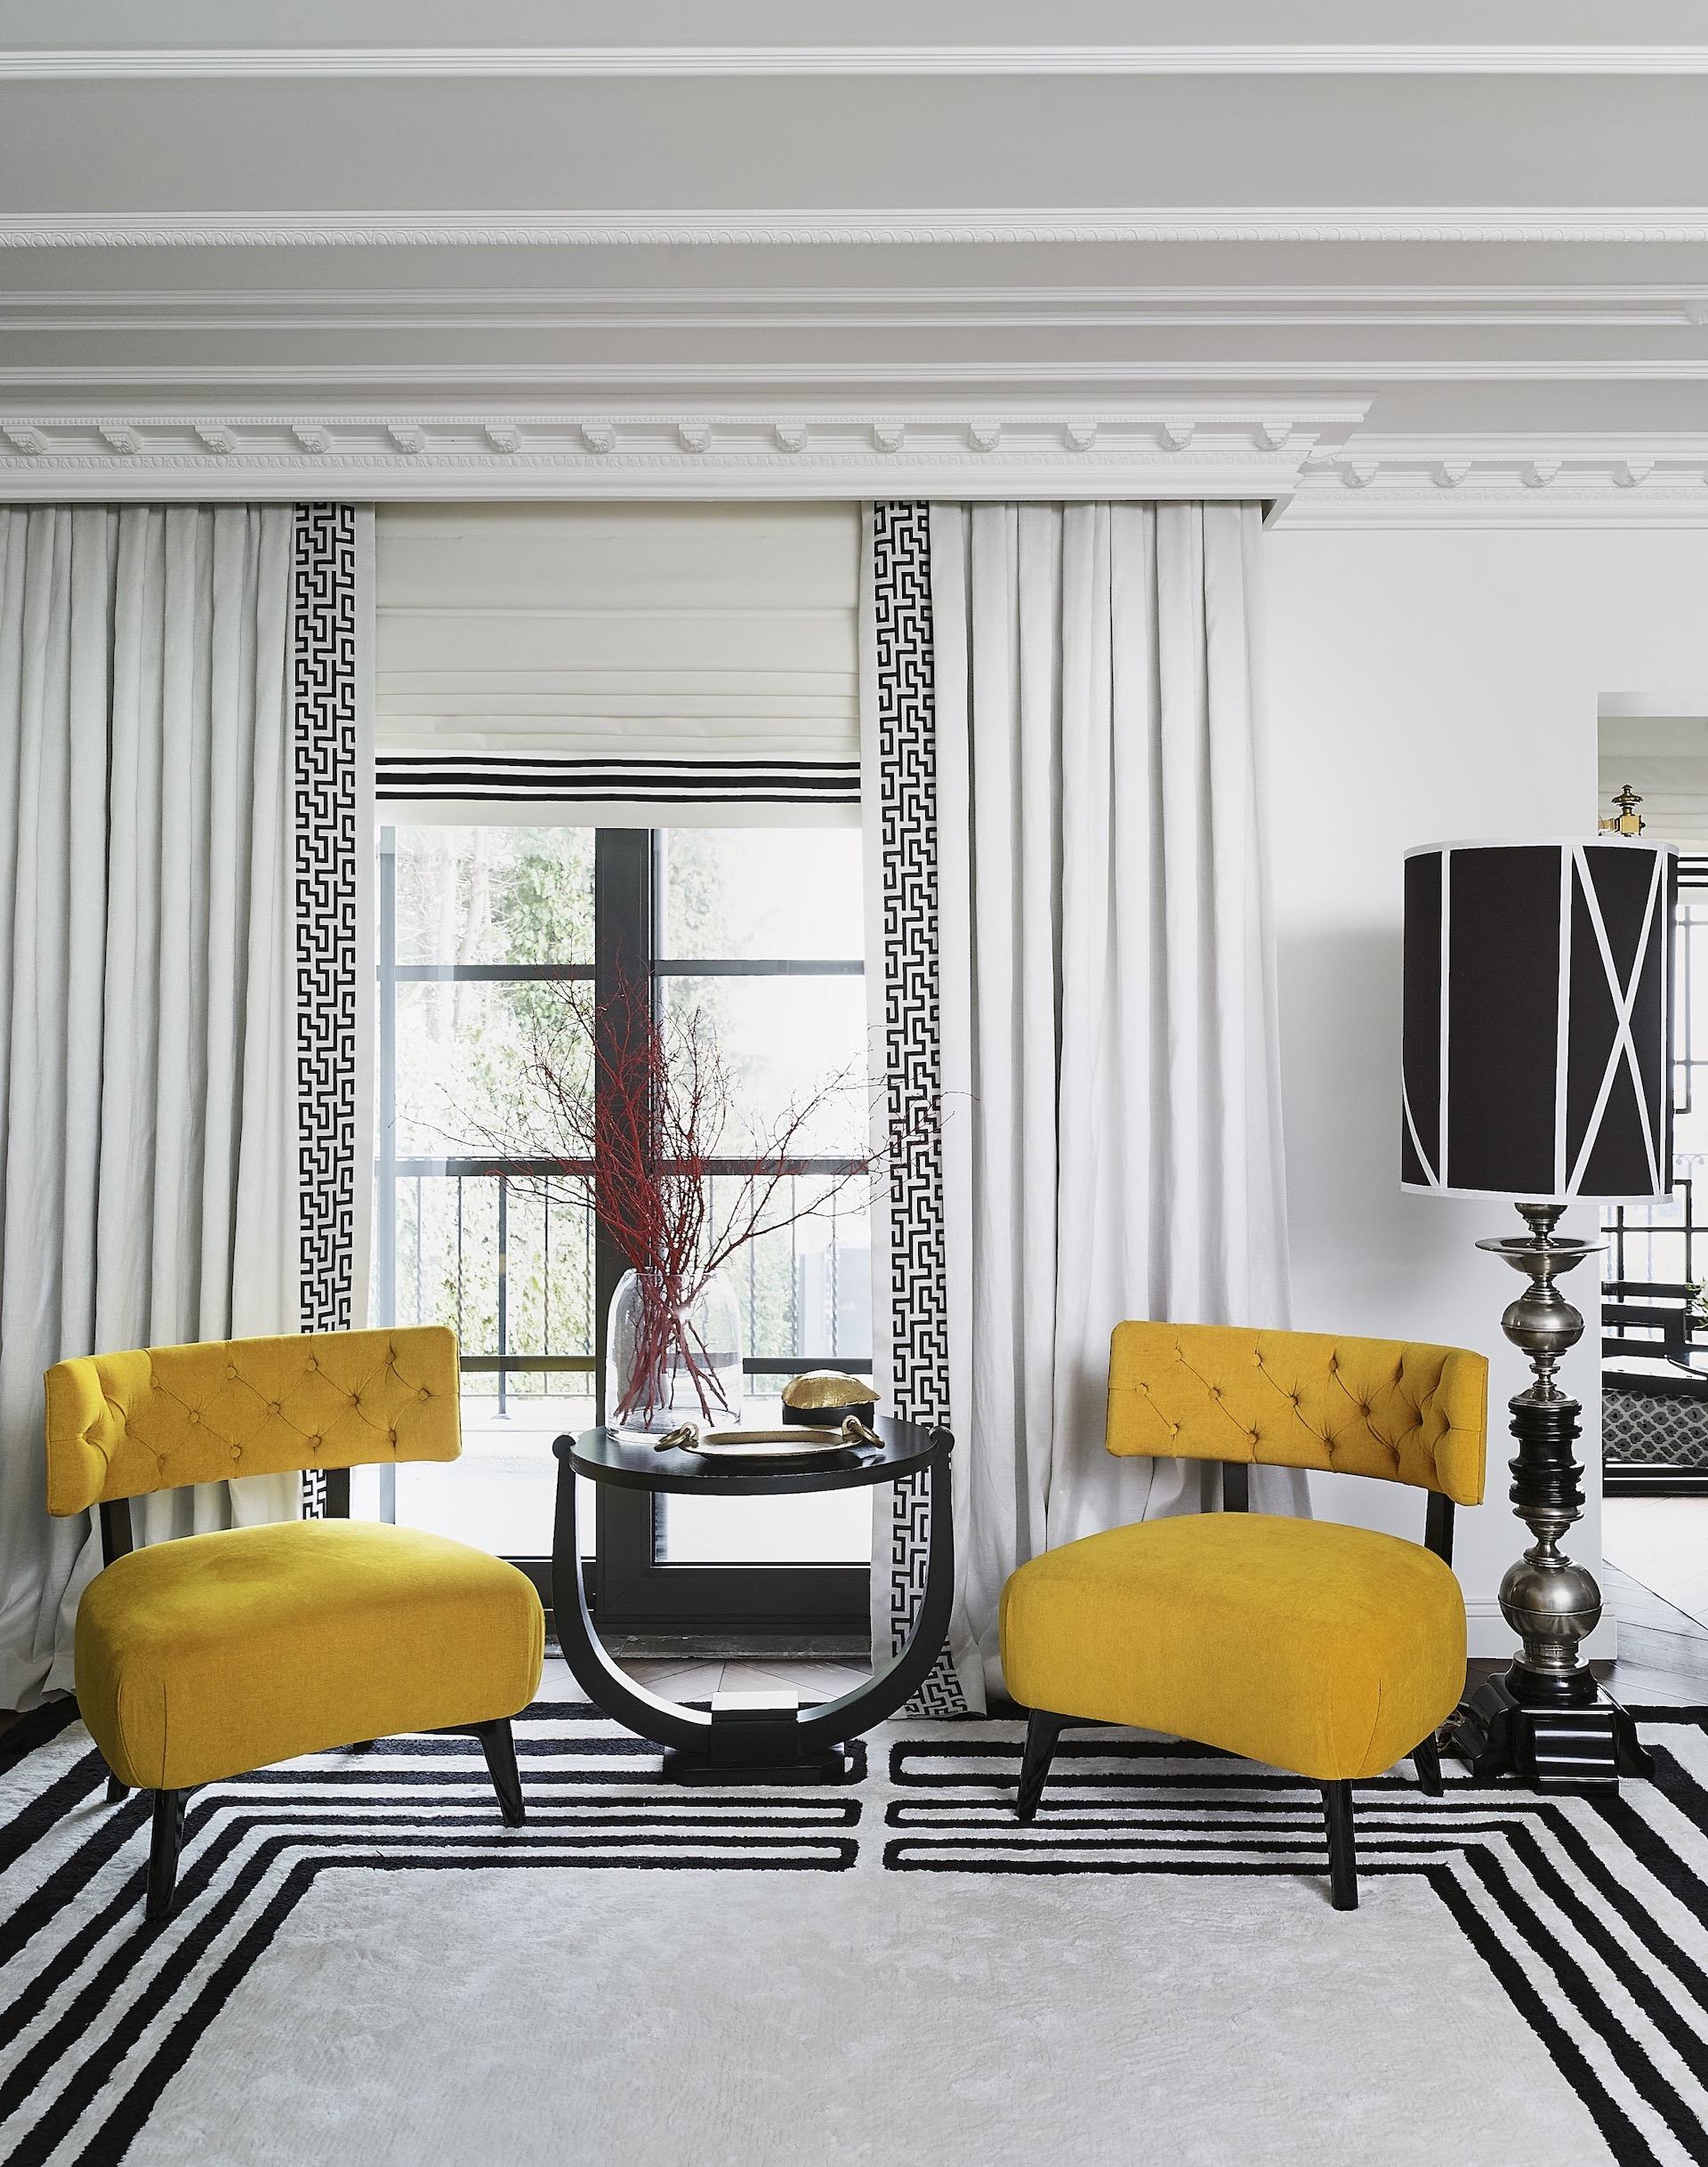 Halide Didem Kurt Interiors & Design